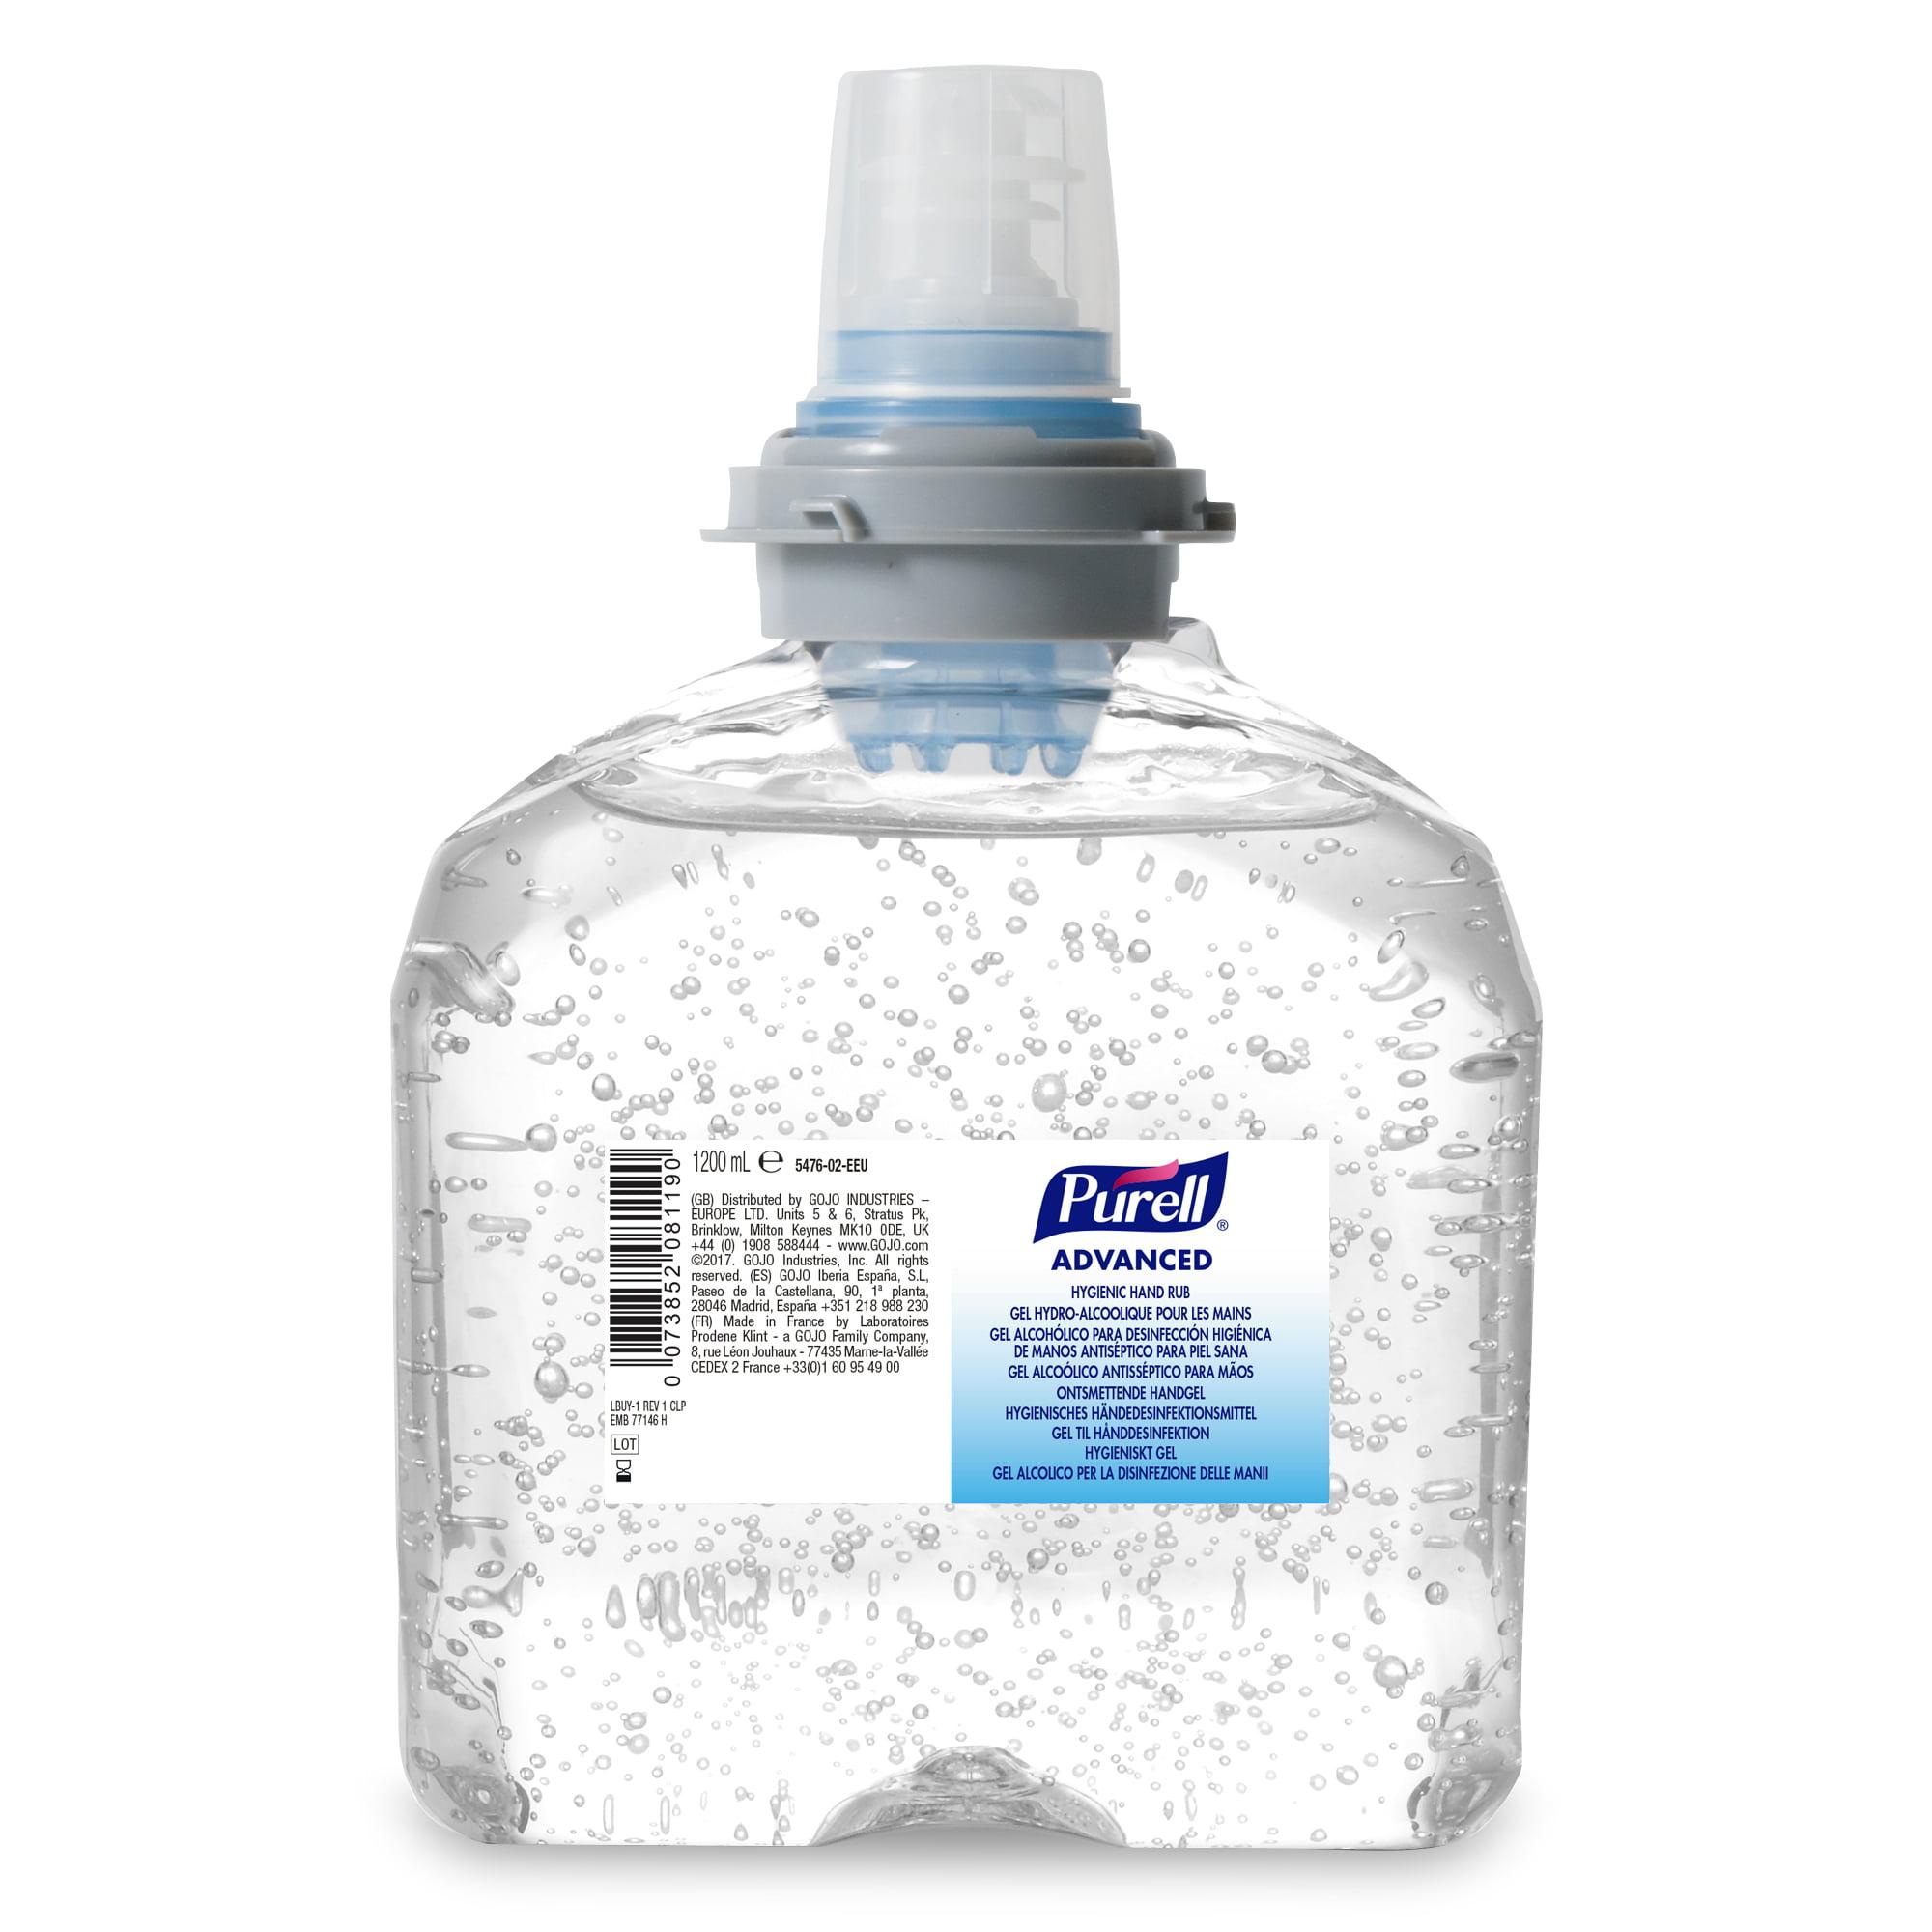 gel-dezinfectant-purell-tfx-5476-1200ml-pentru-dozator-cu-senzor